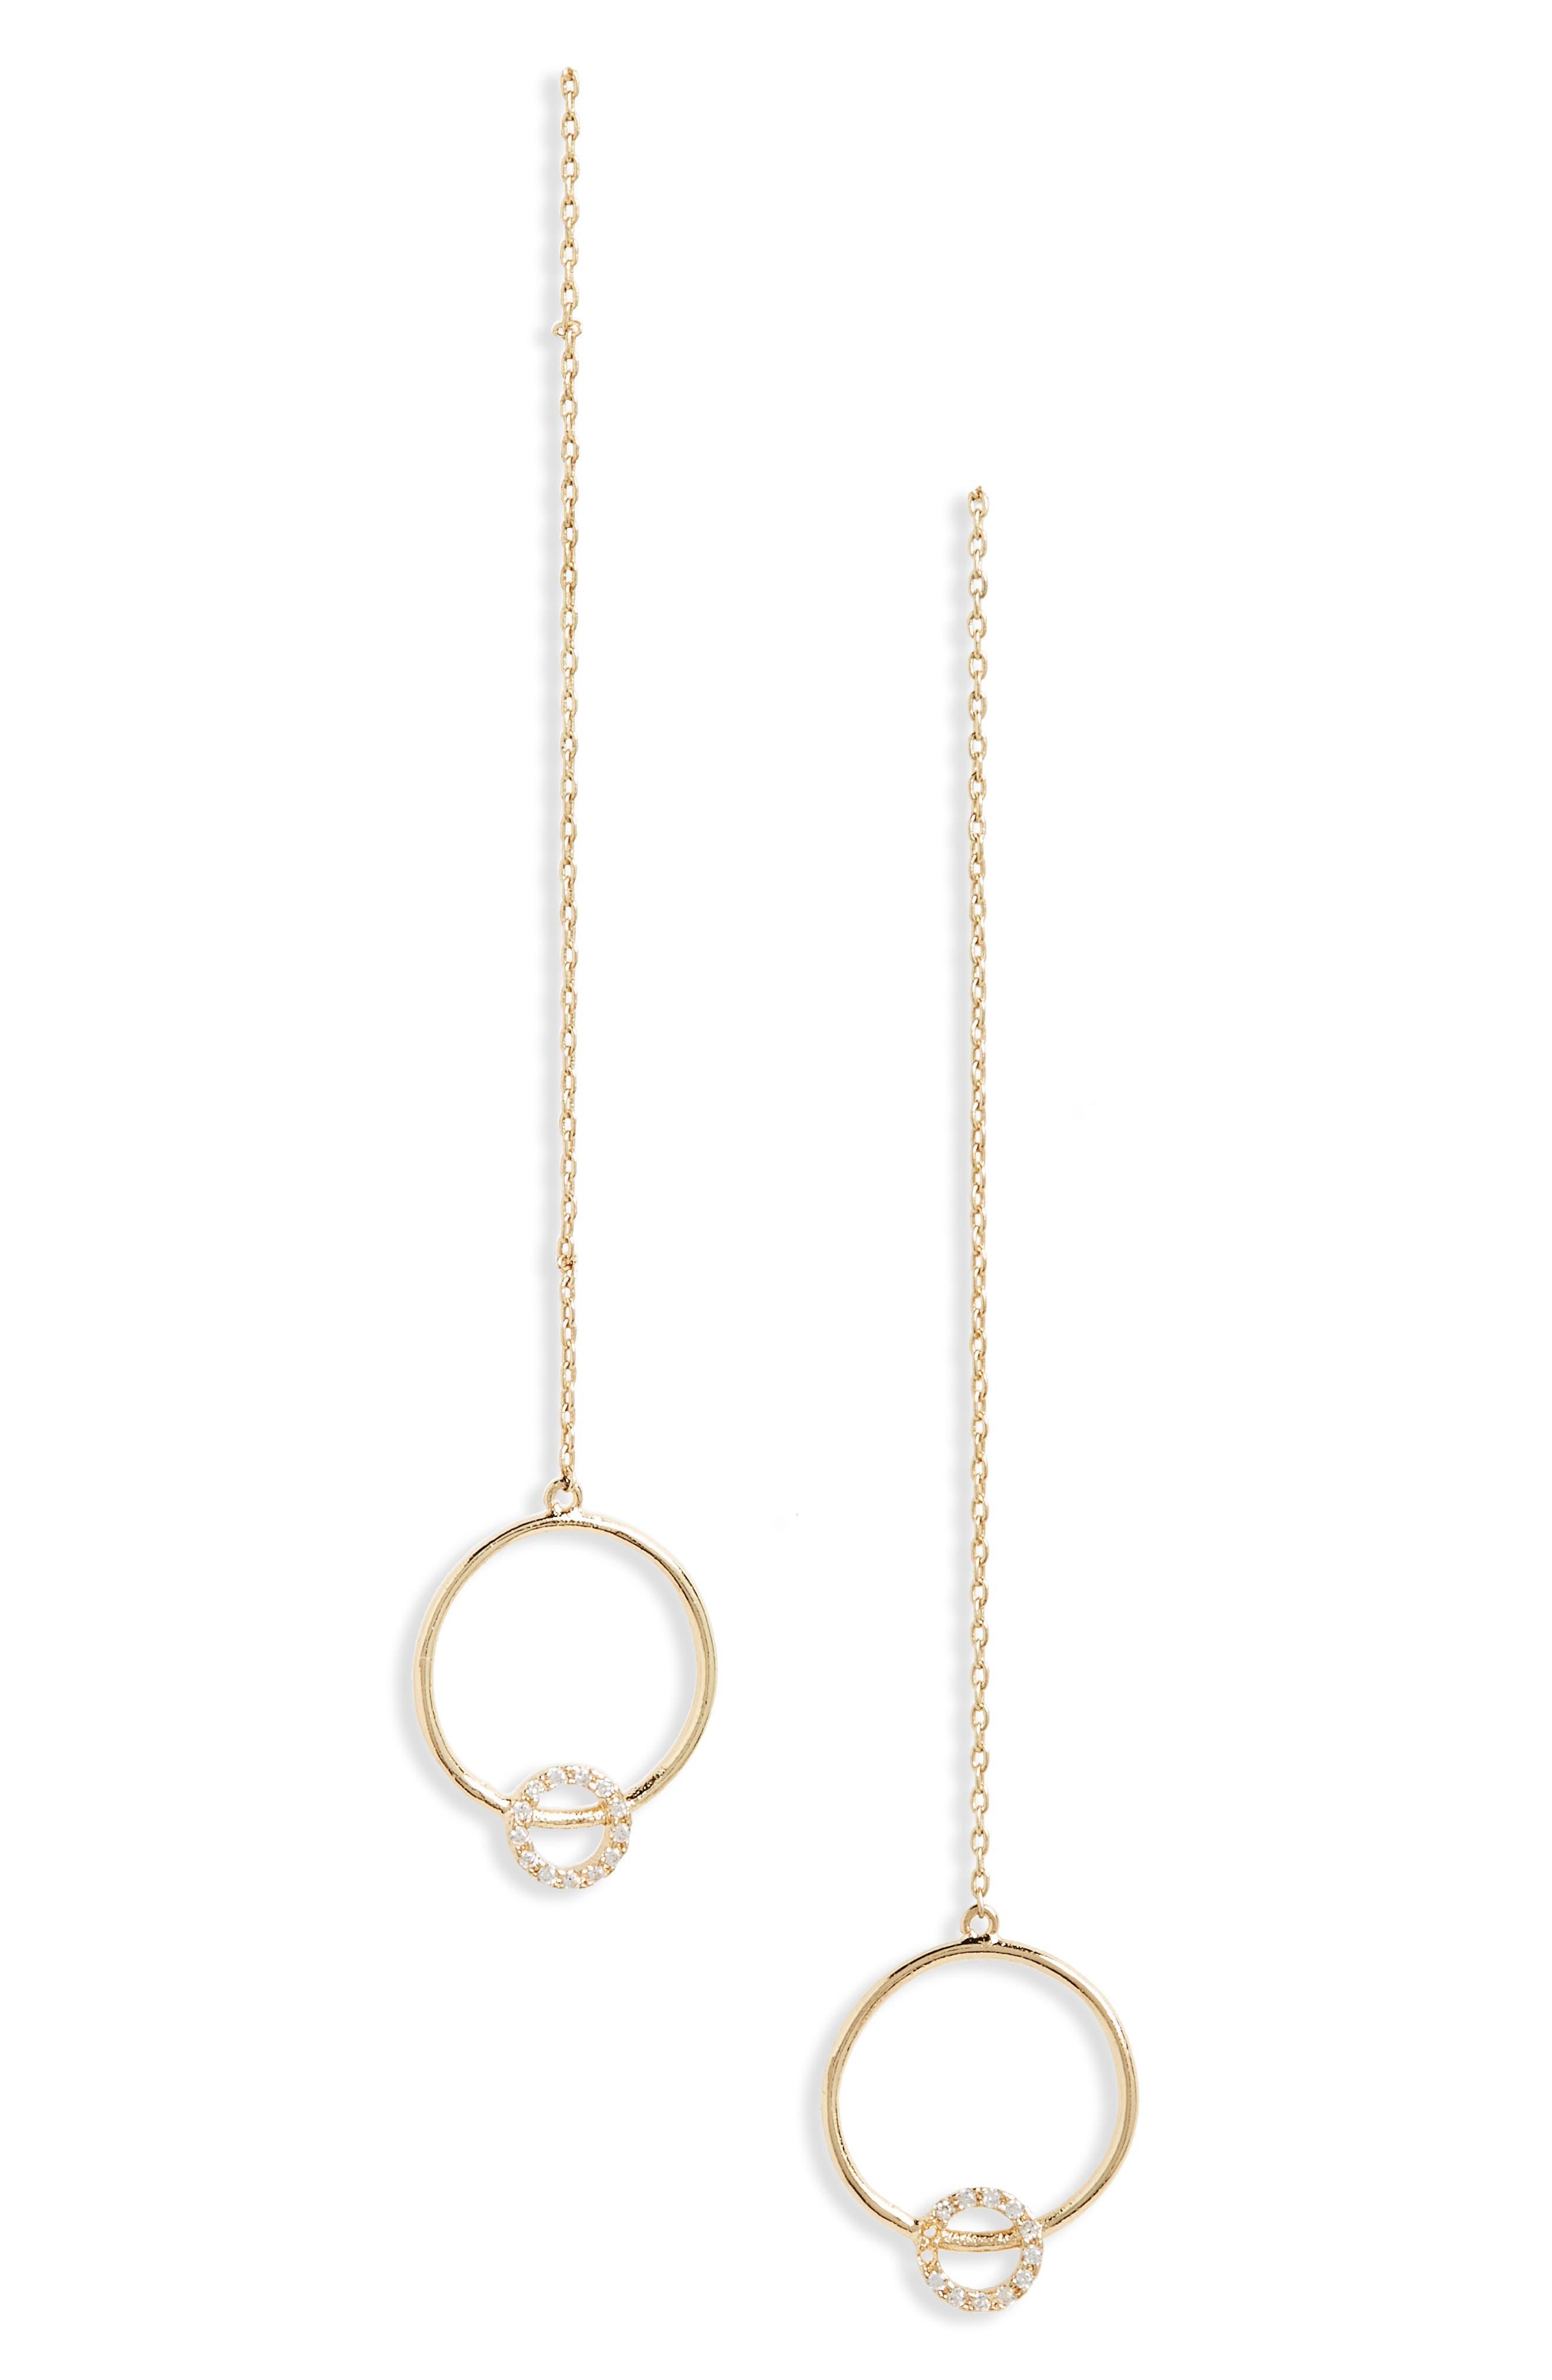 Crystal Circle Drop Earrings,                             Main thumbnail 1, color,                             Gold